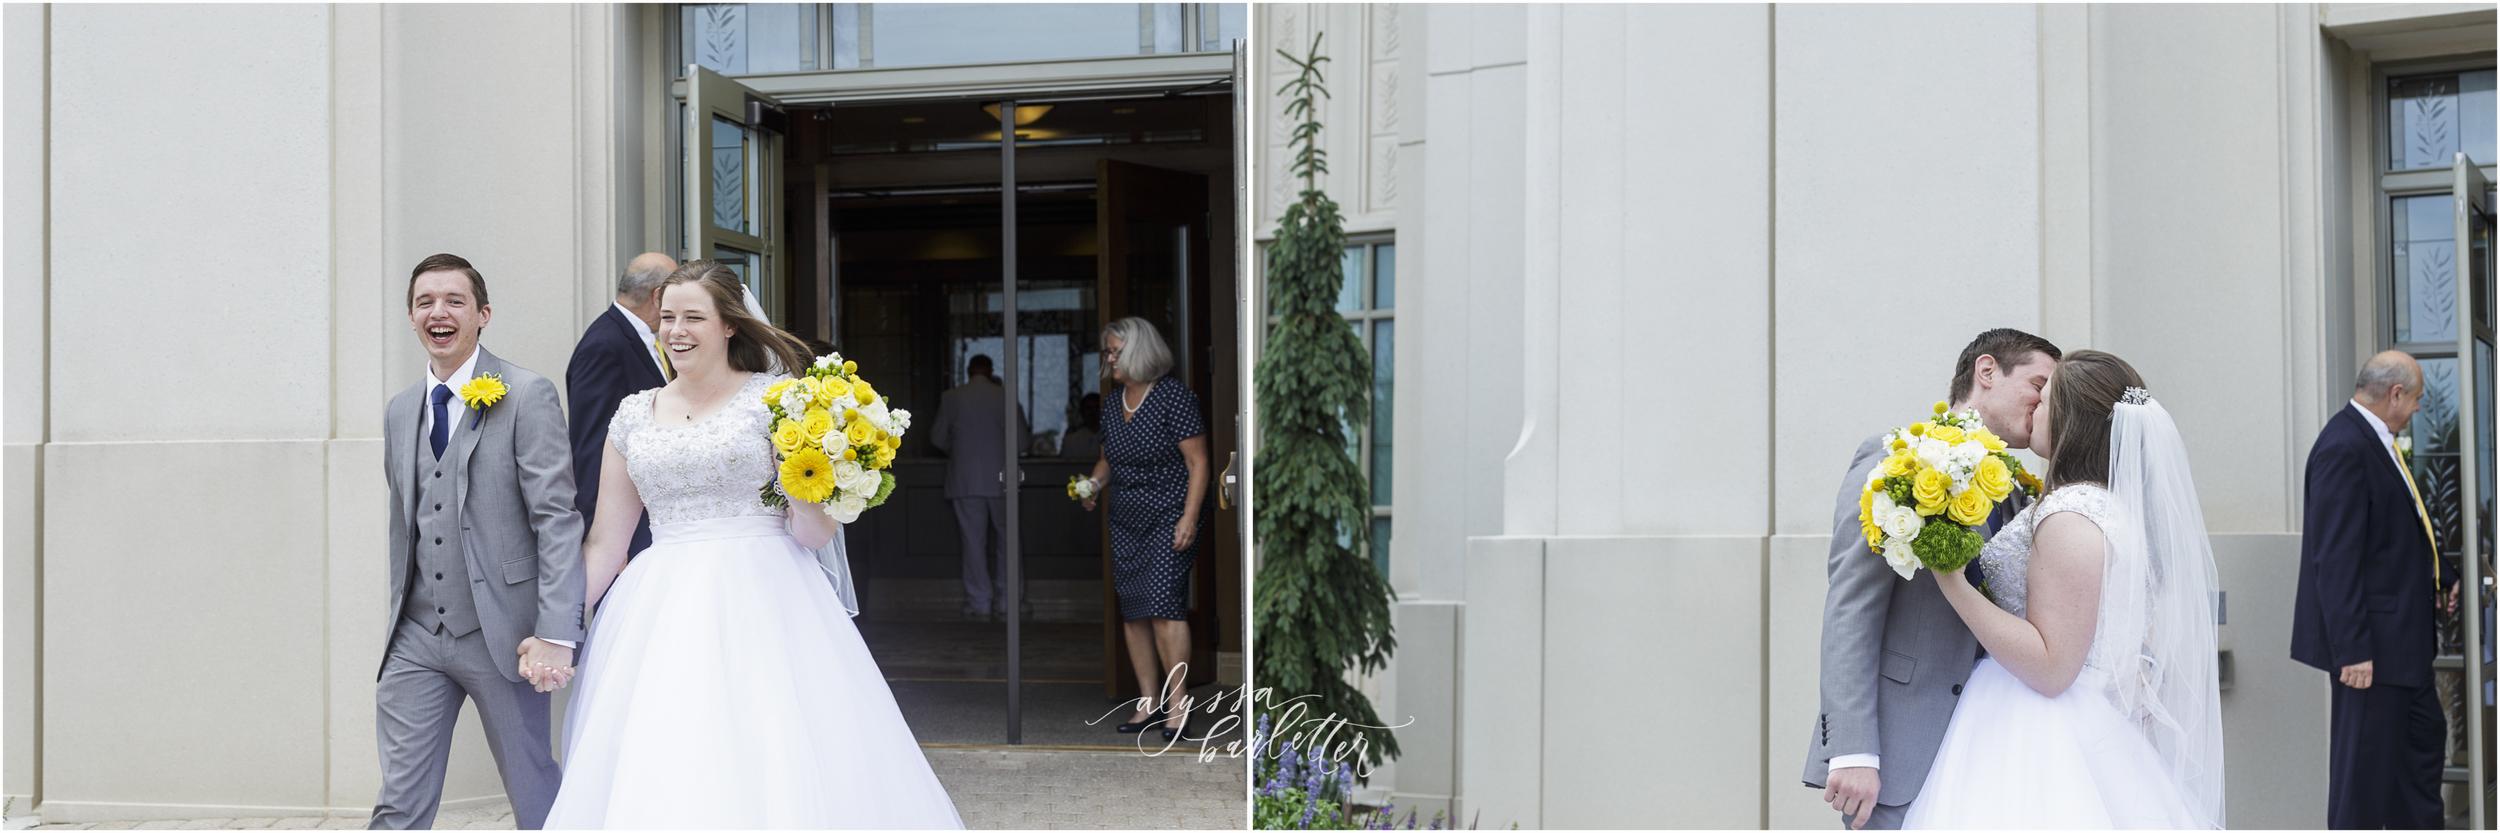 kansas city lds temple wedding